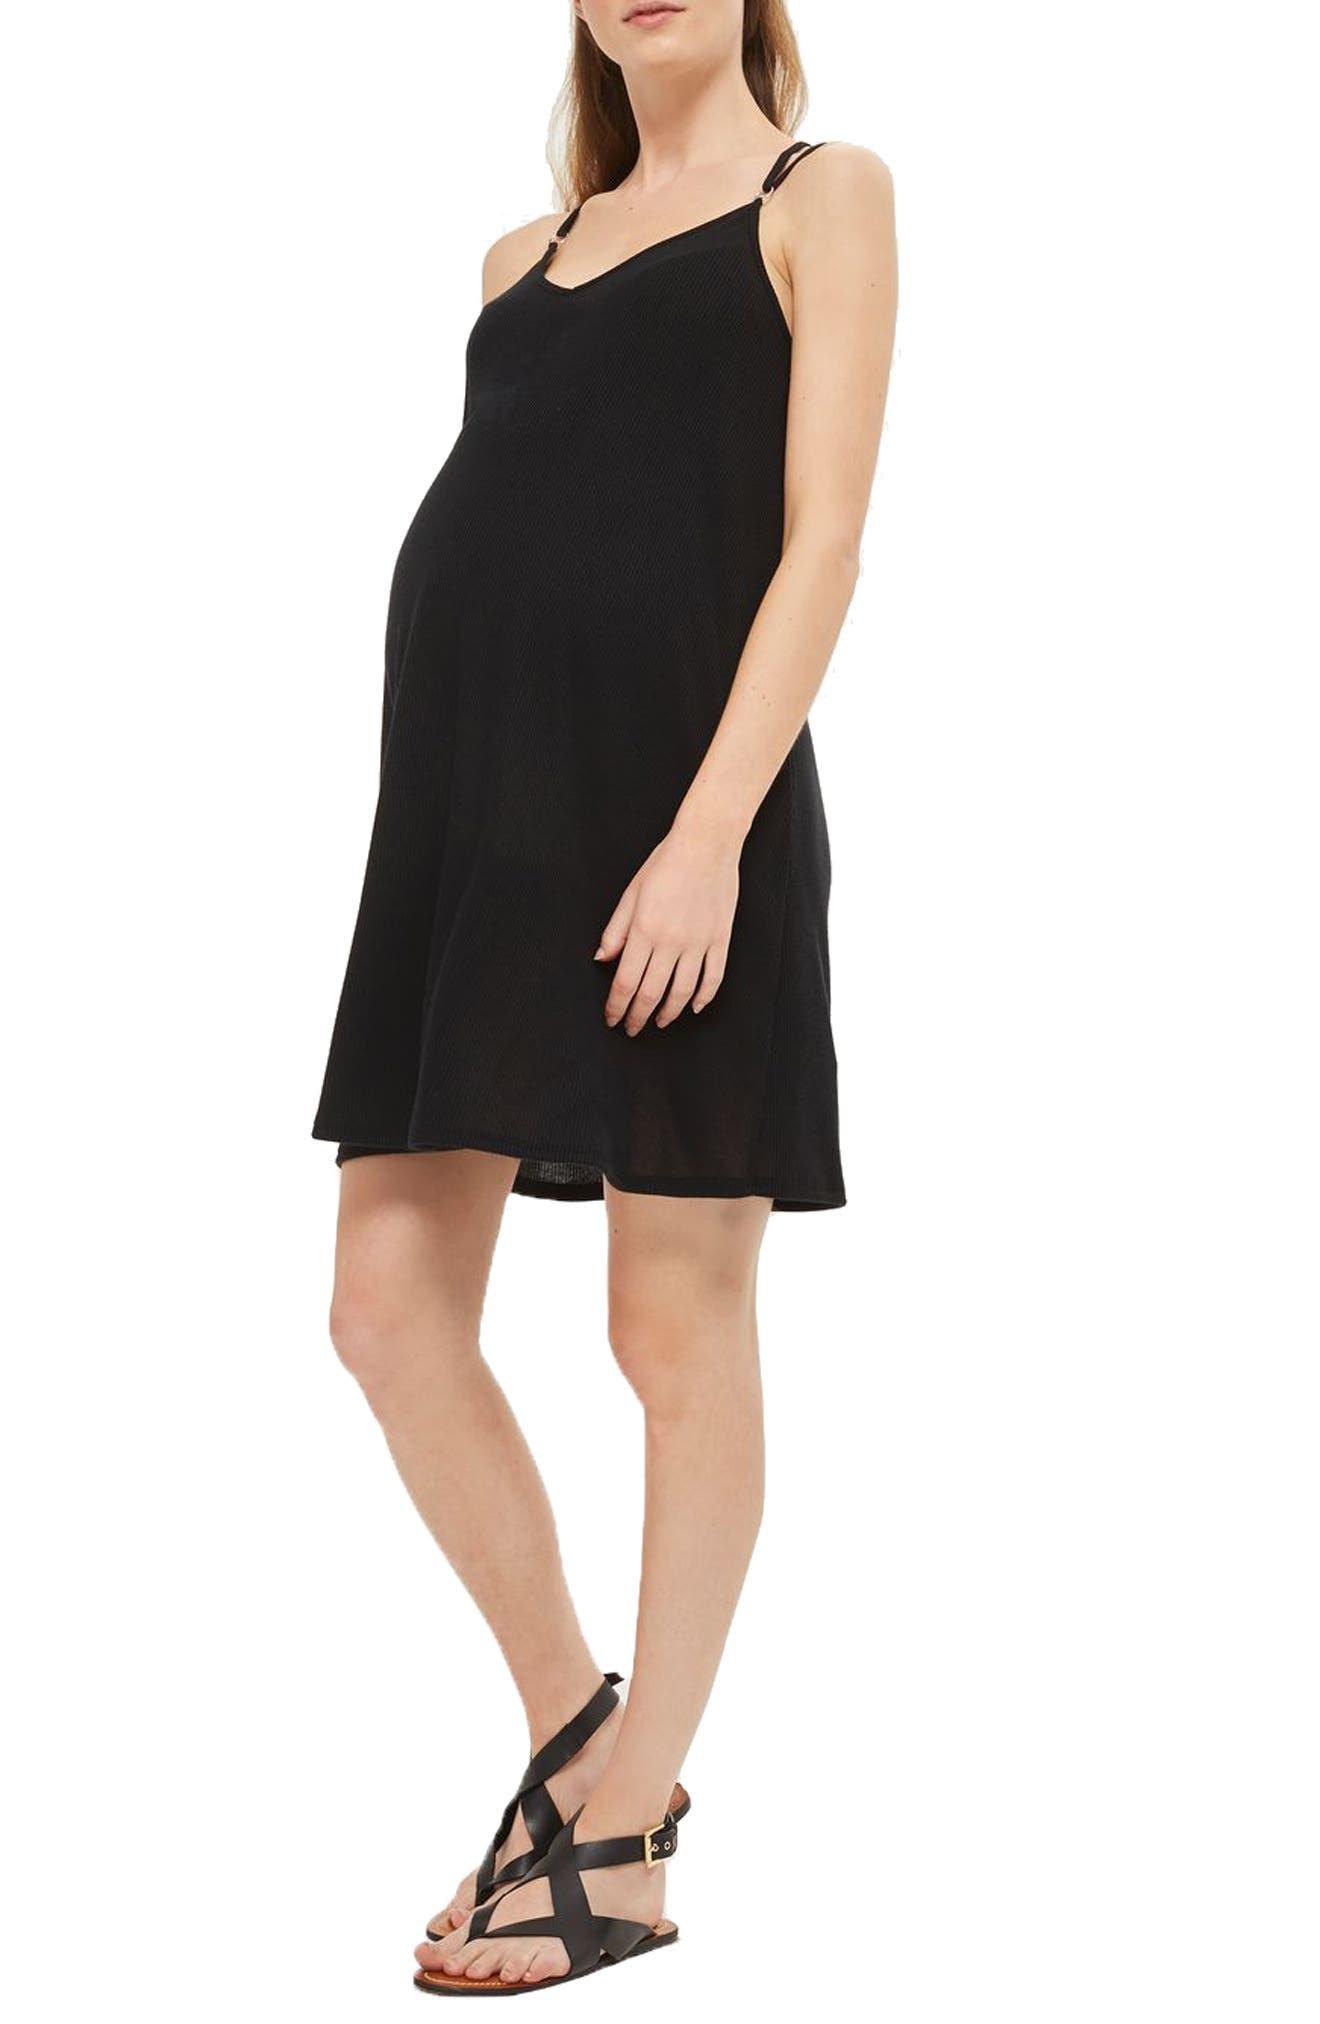 Topshop Rib Trapeze Maternity Dress